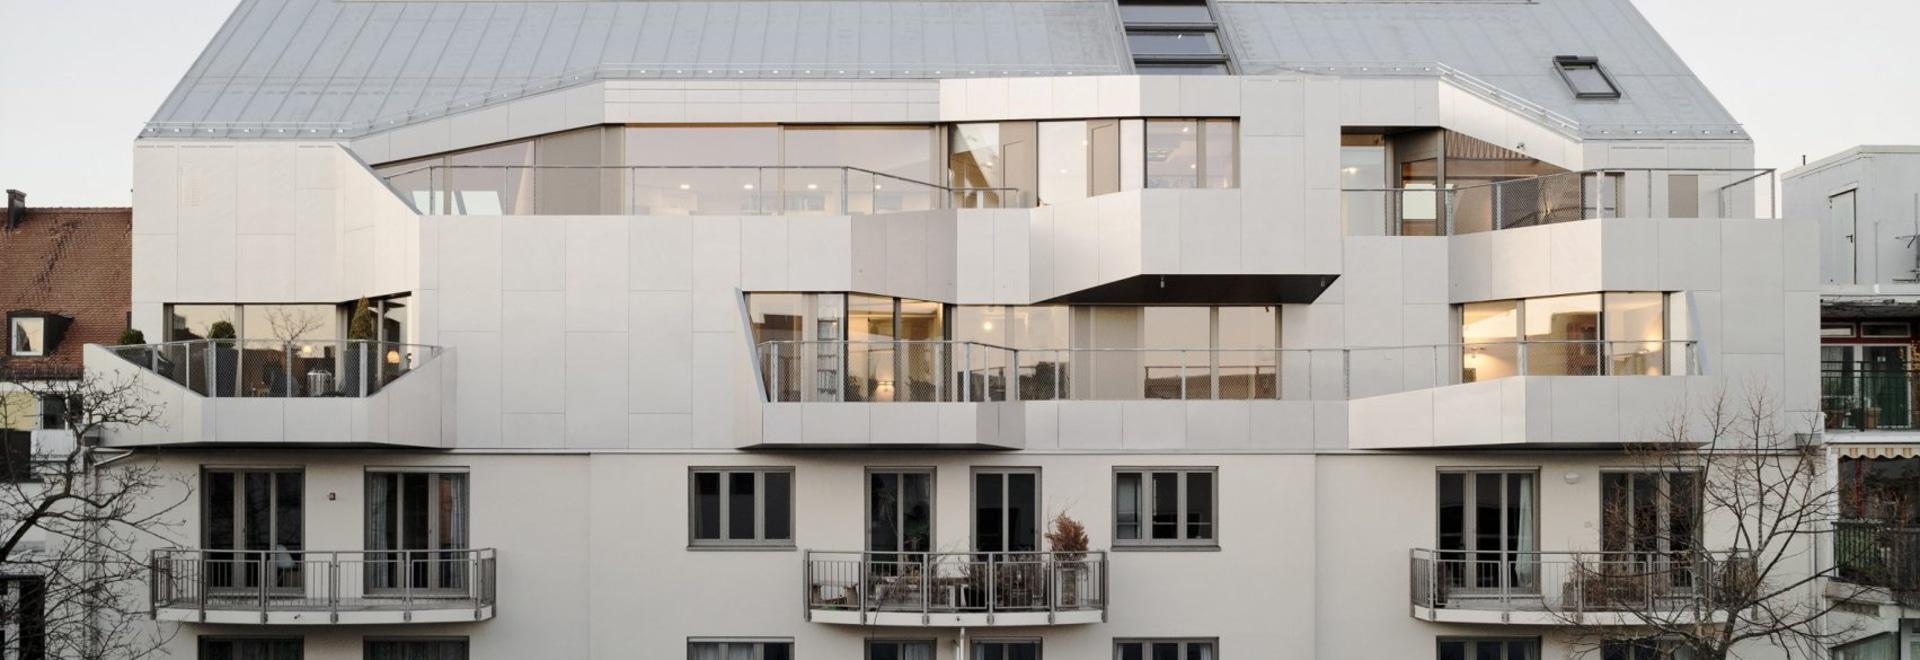 Pool Leber Architekten swaps concrete for wood to create R11 loft extension